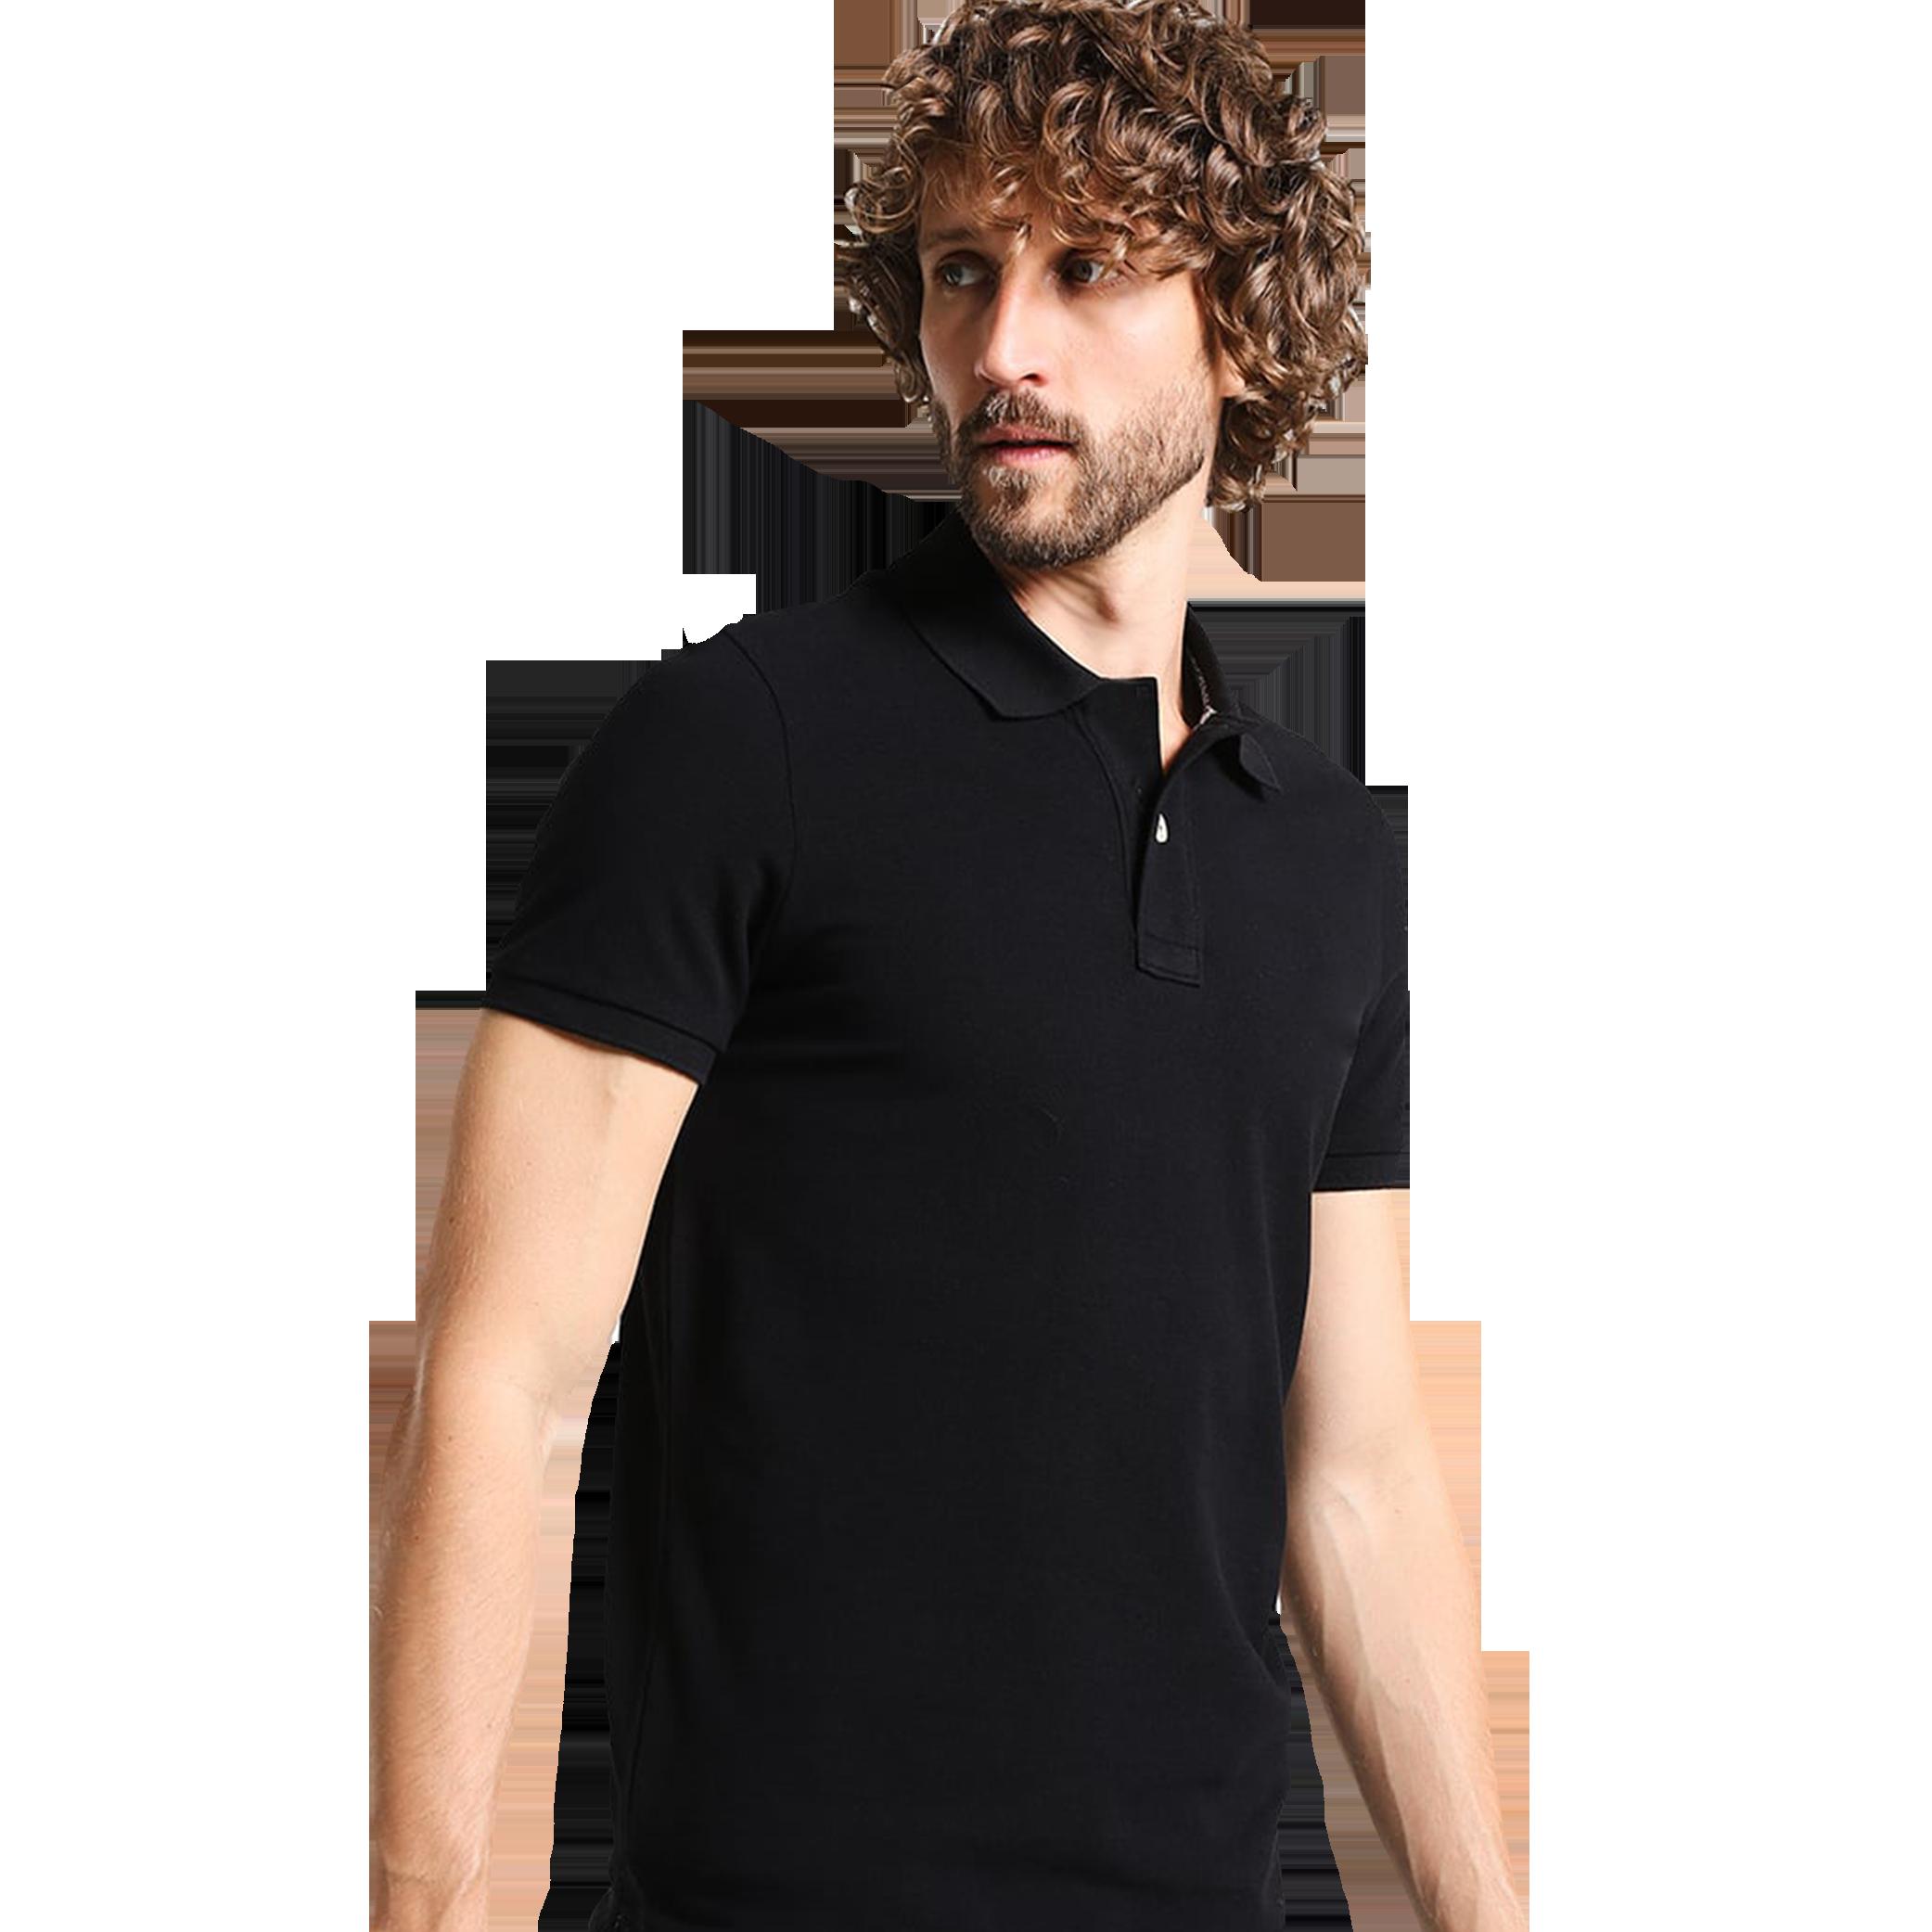 c2241d8b3 Unisex Polo T-shirt   T-shirt Loot – Customized T-shirts India ...